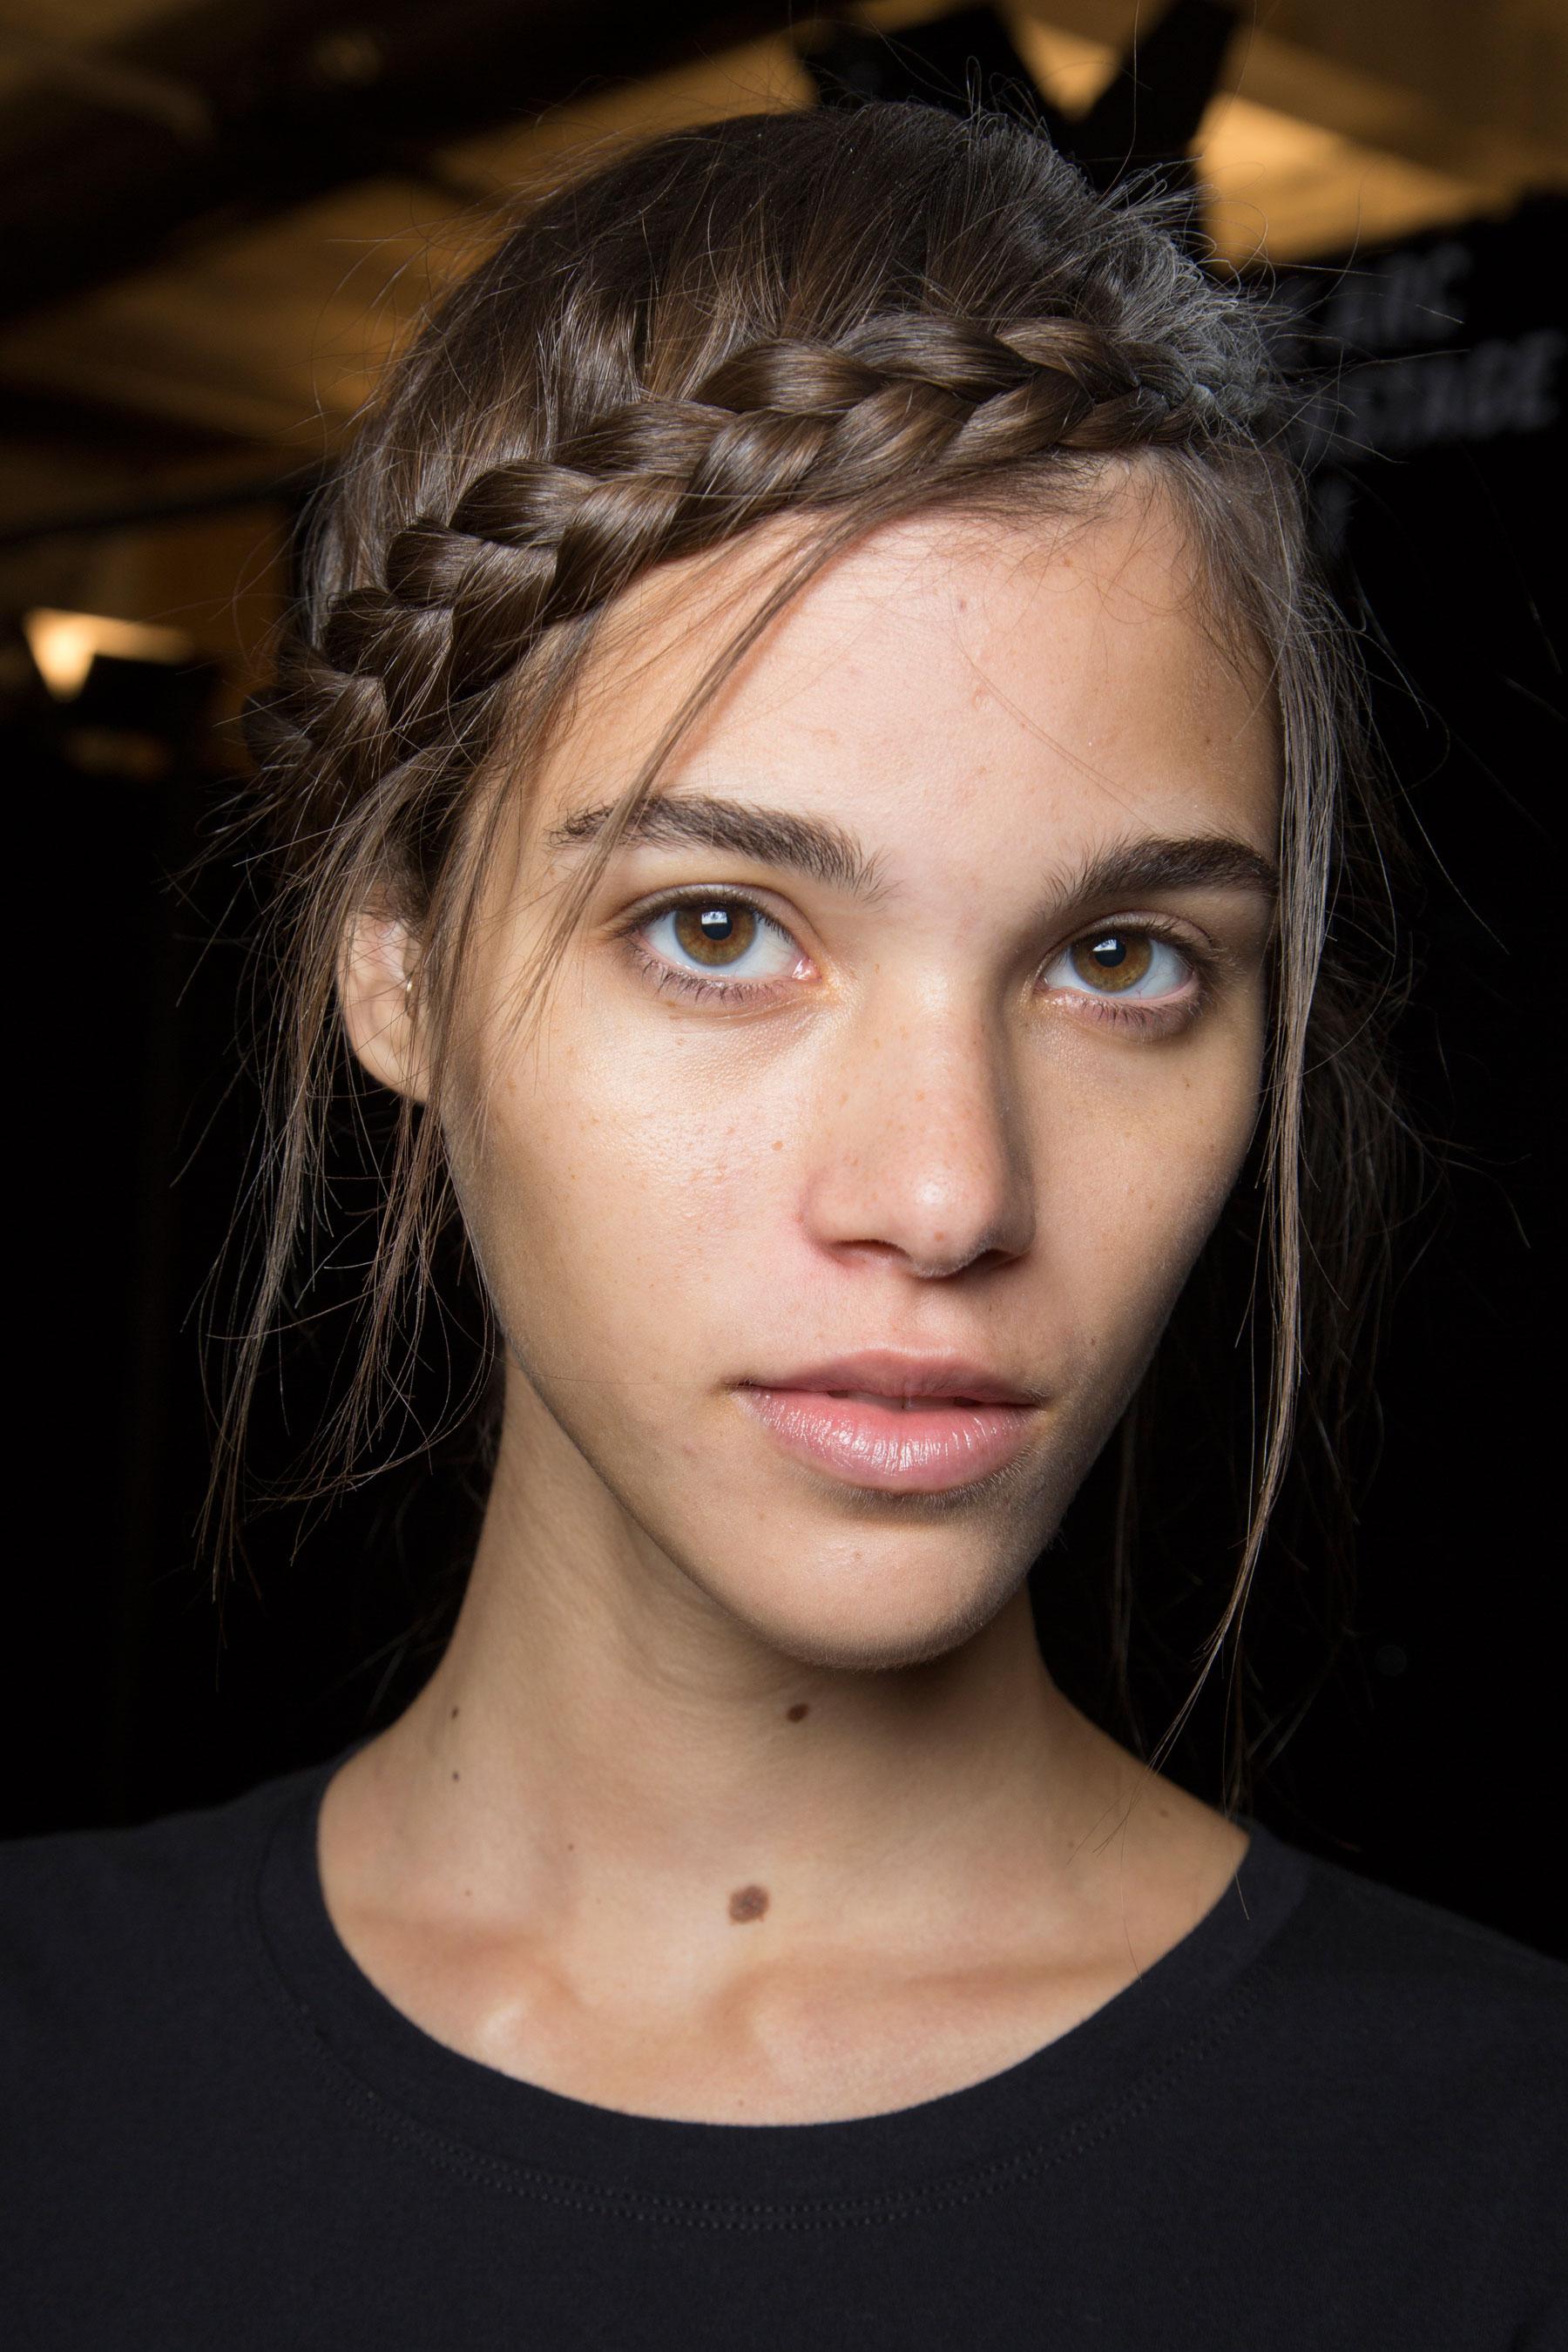 Herve-Leger-backstage-beauty-spring-2016-fashion-show-the-impression-64